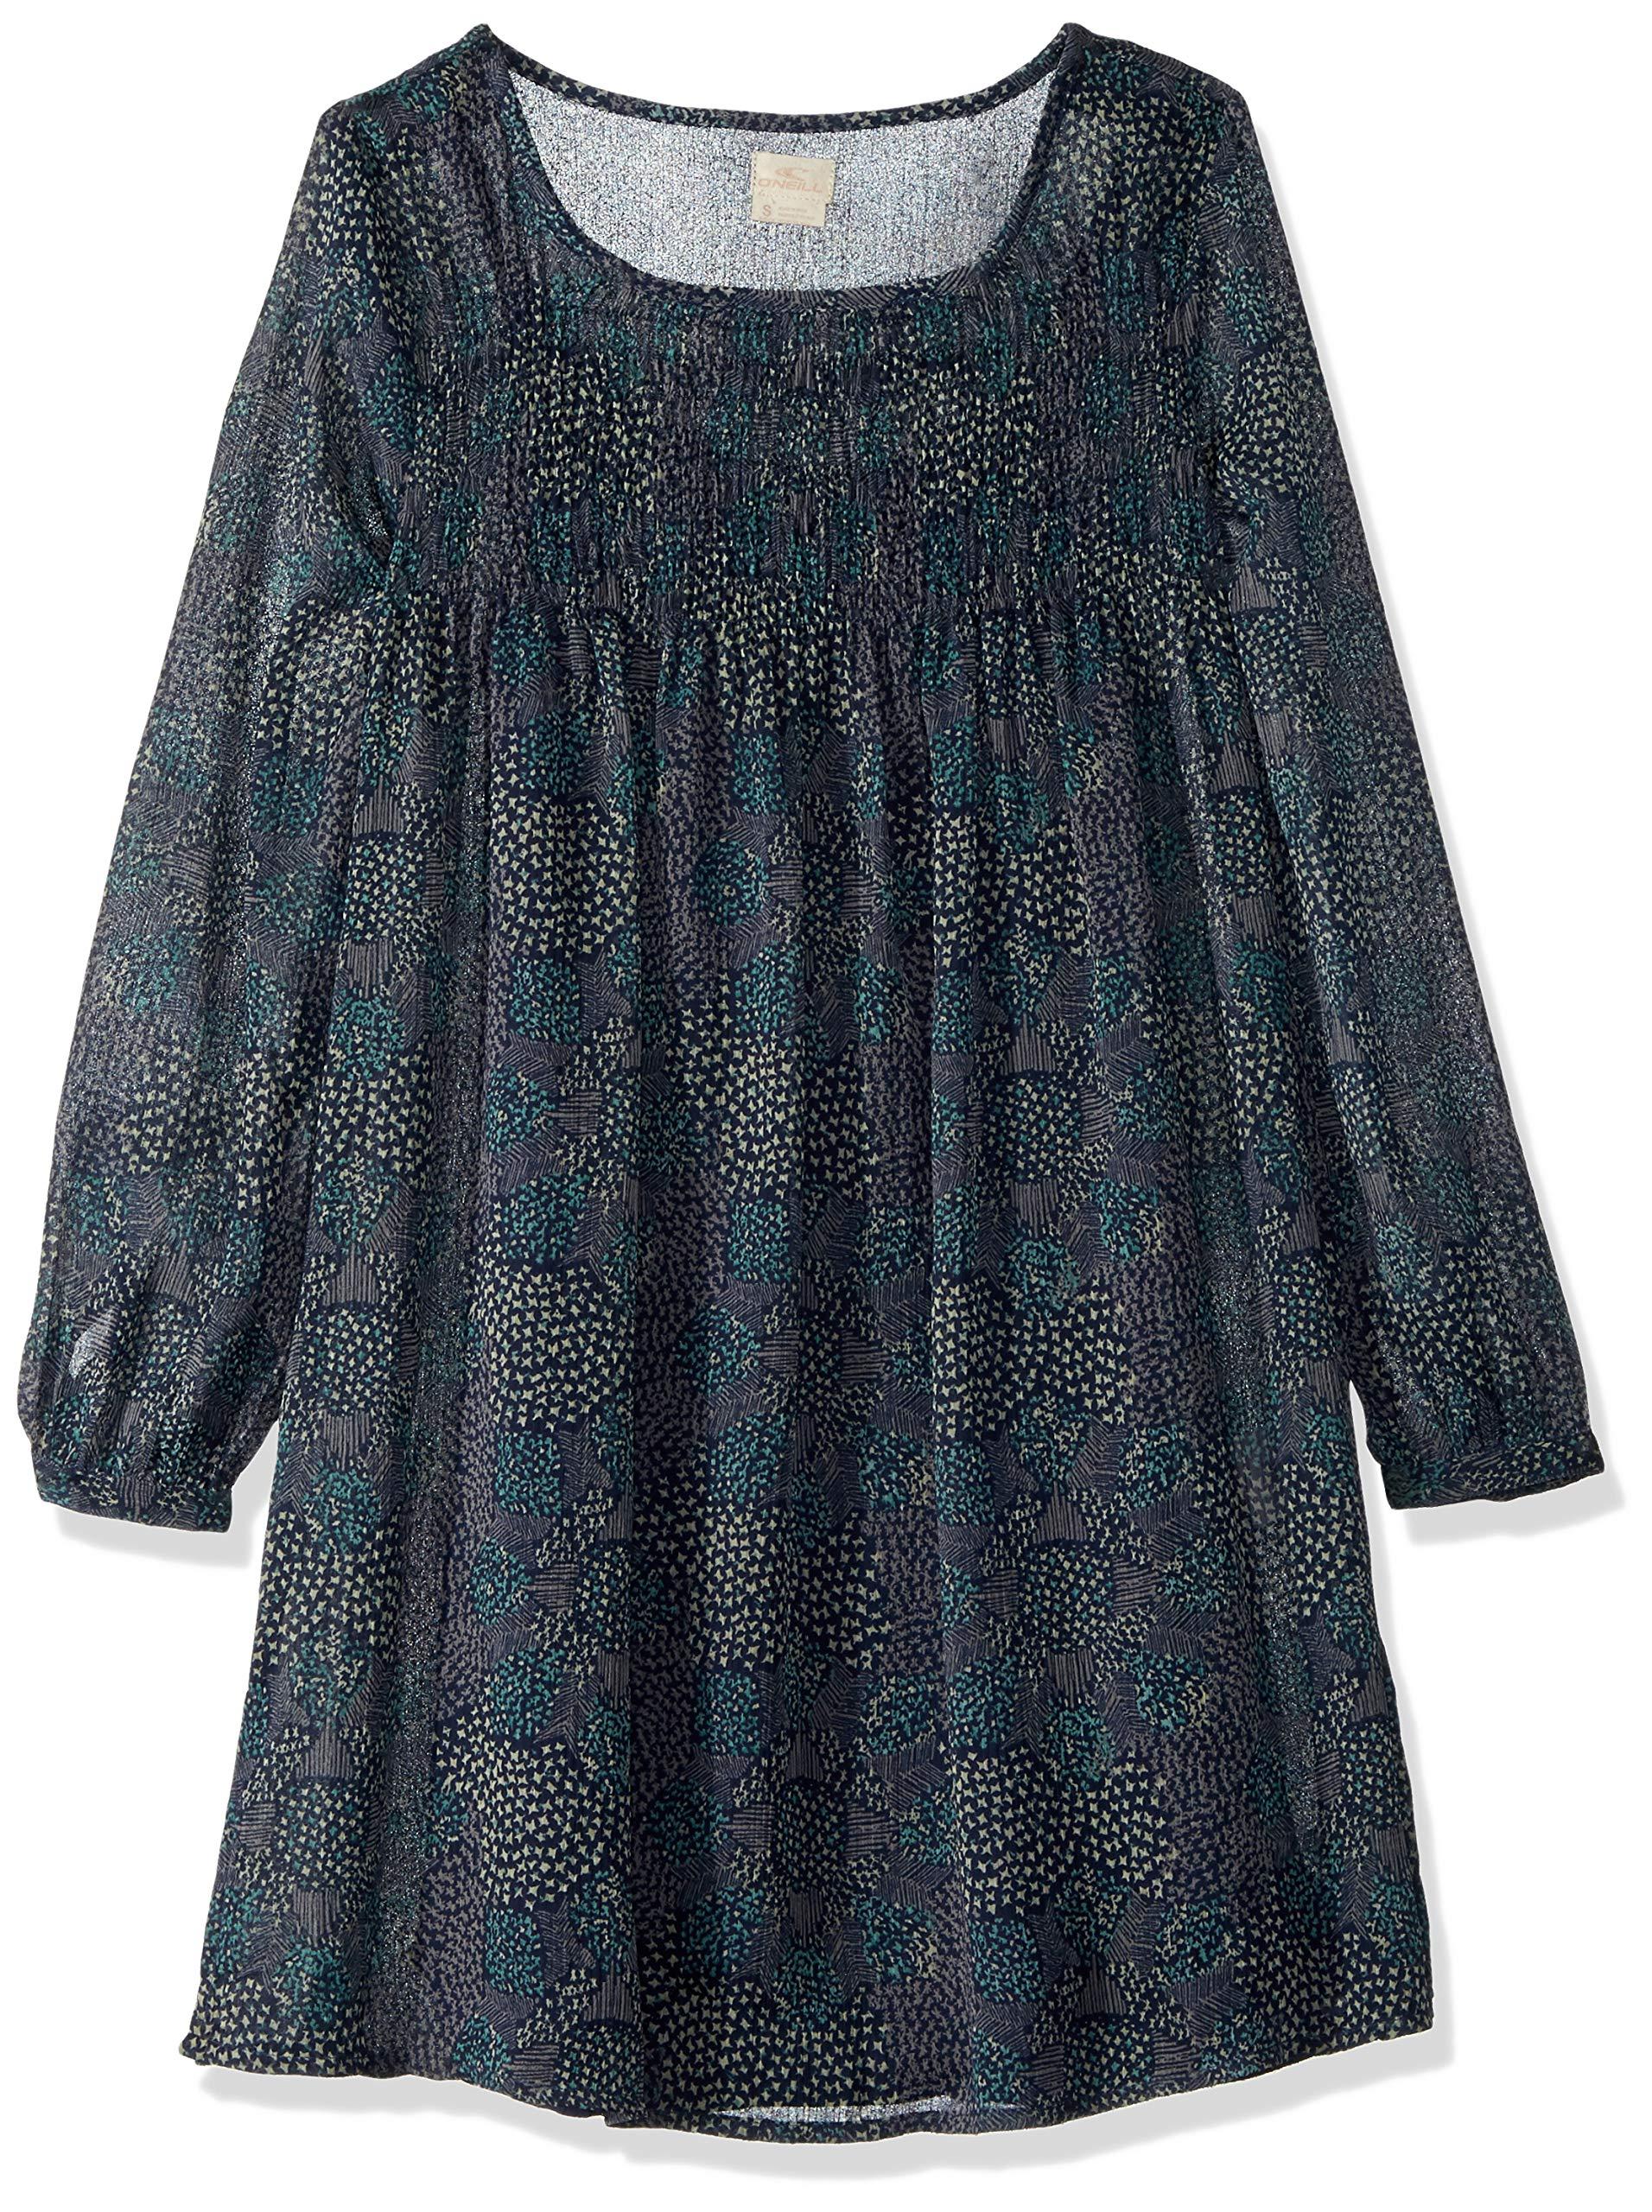 O'Neill Girls' Big Summer Dress, Mood Indigo, M